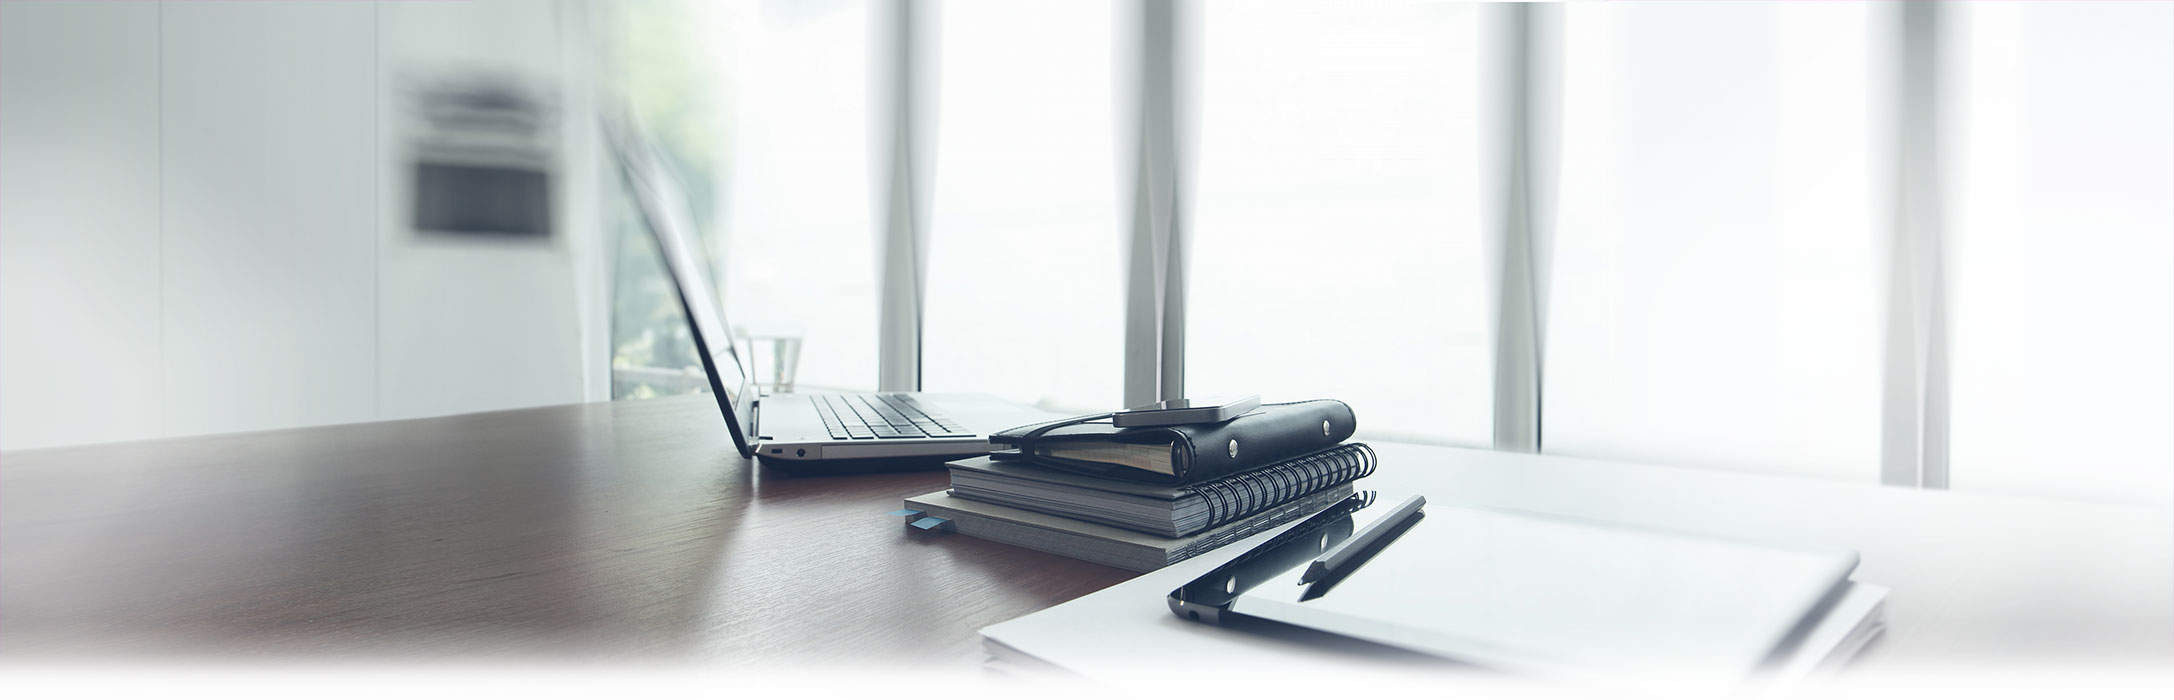 ielts essay type format pdf